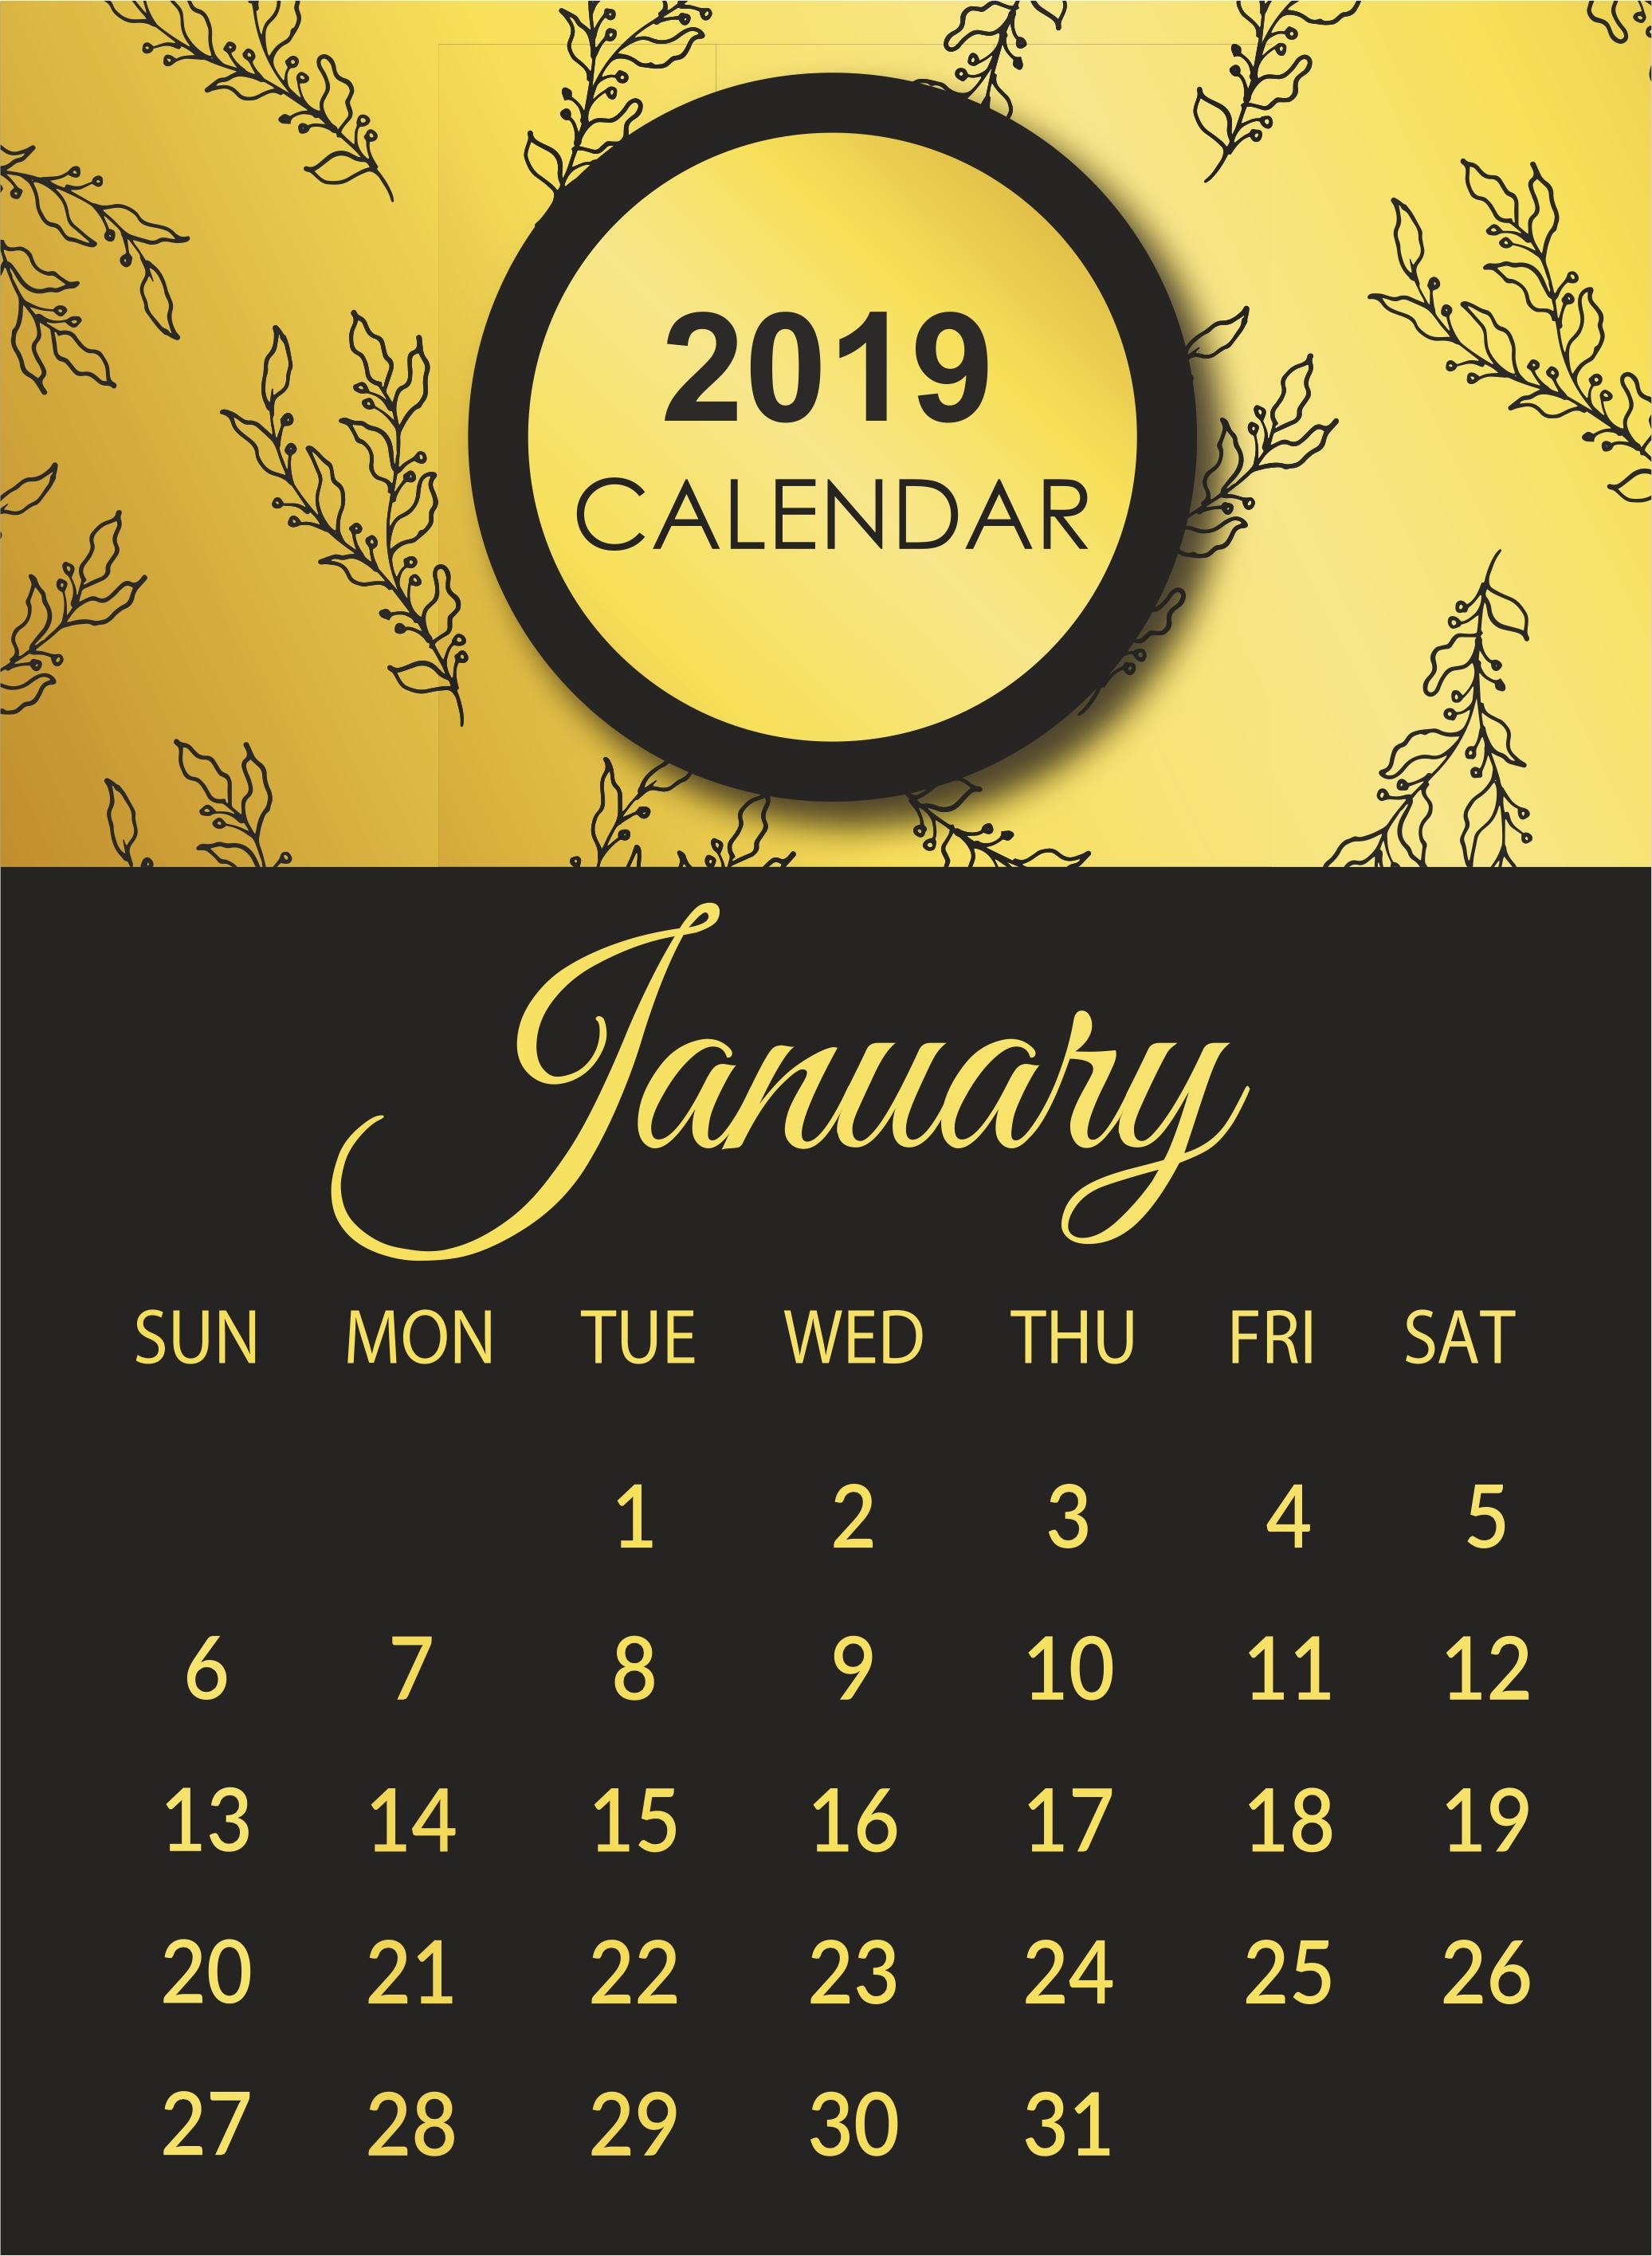 Blank 2019 January Calendar Printable Template Excel | Blank 2019 January 8 2019 Calendar